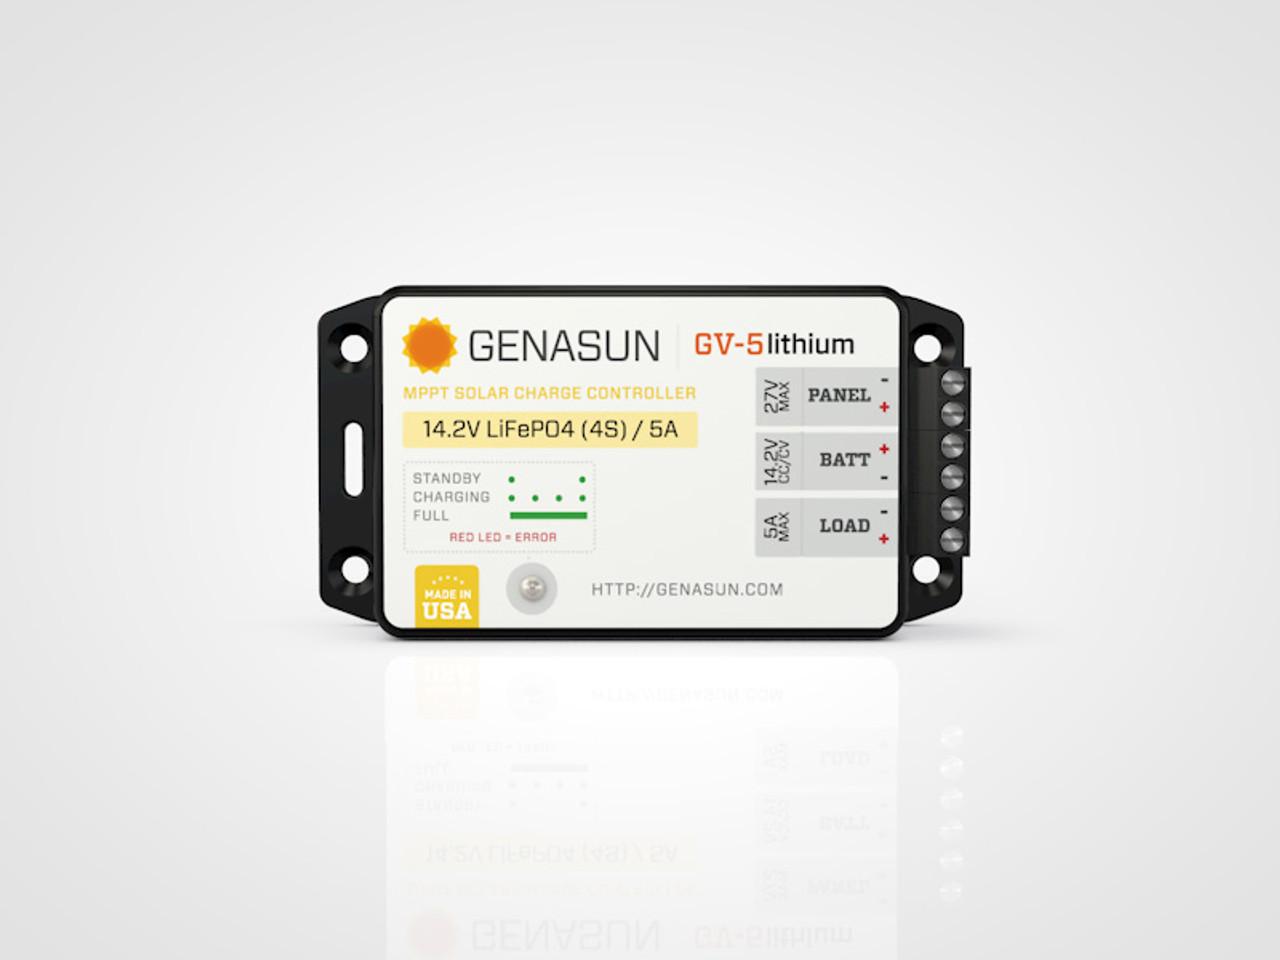 GV-5   65W 5A Genasun MPPT Solar Charge Controller - Li - Front